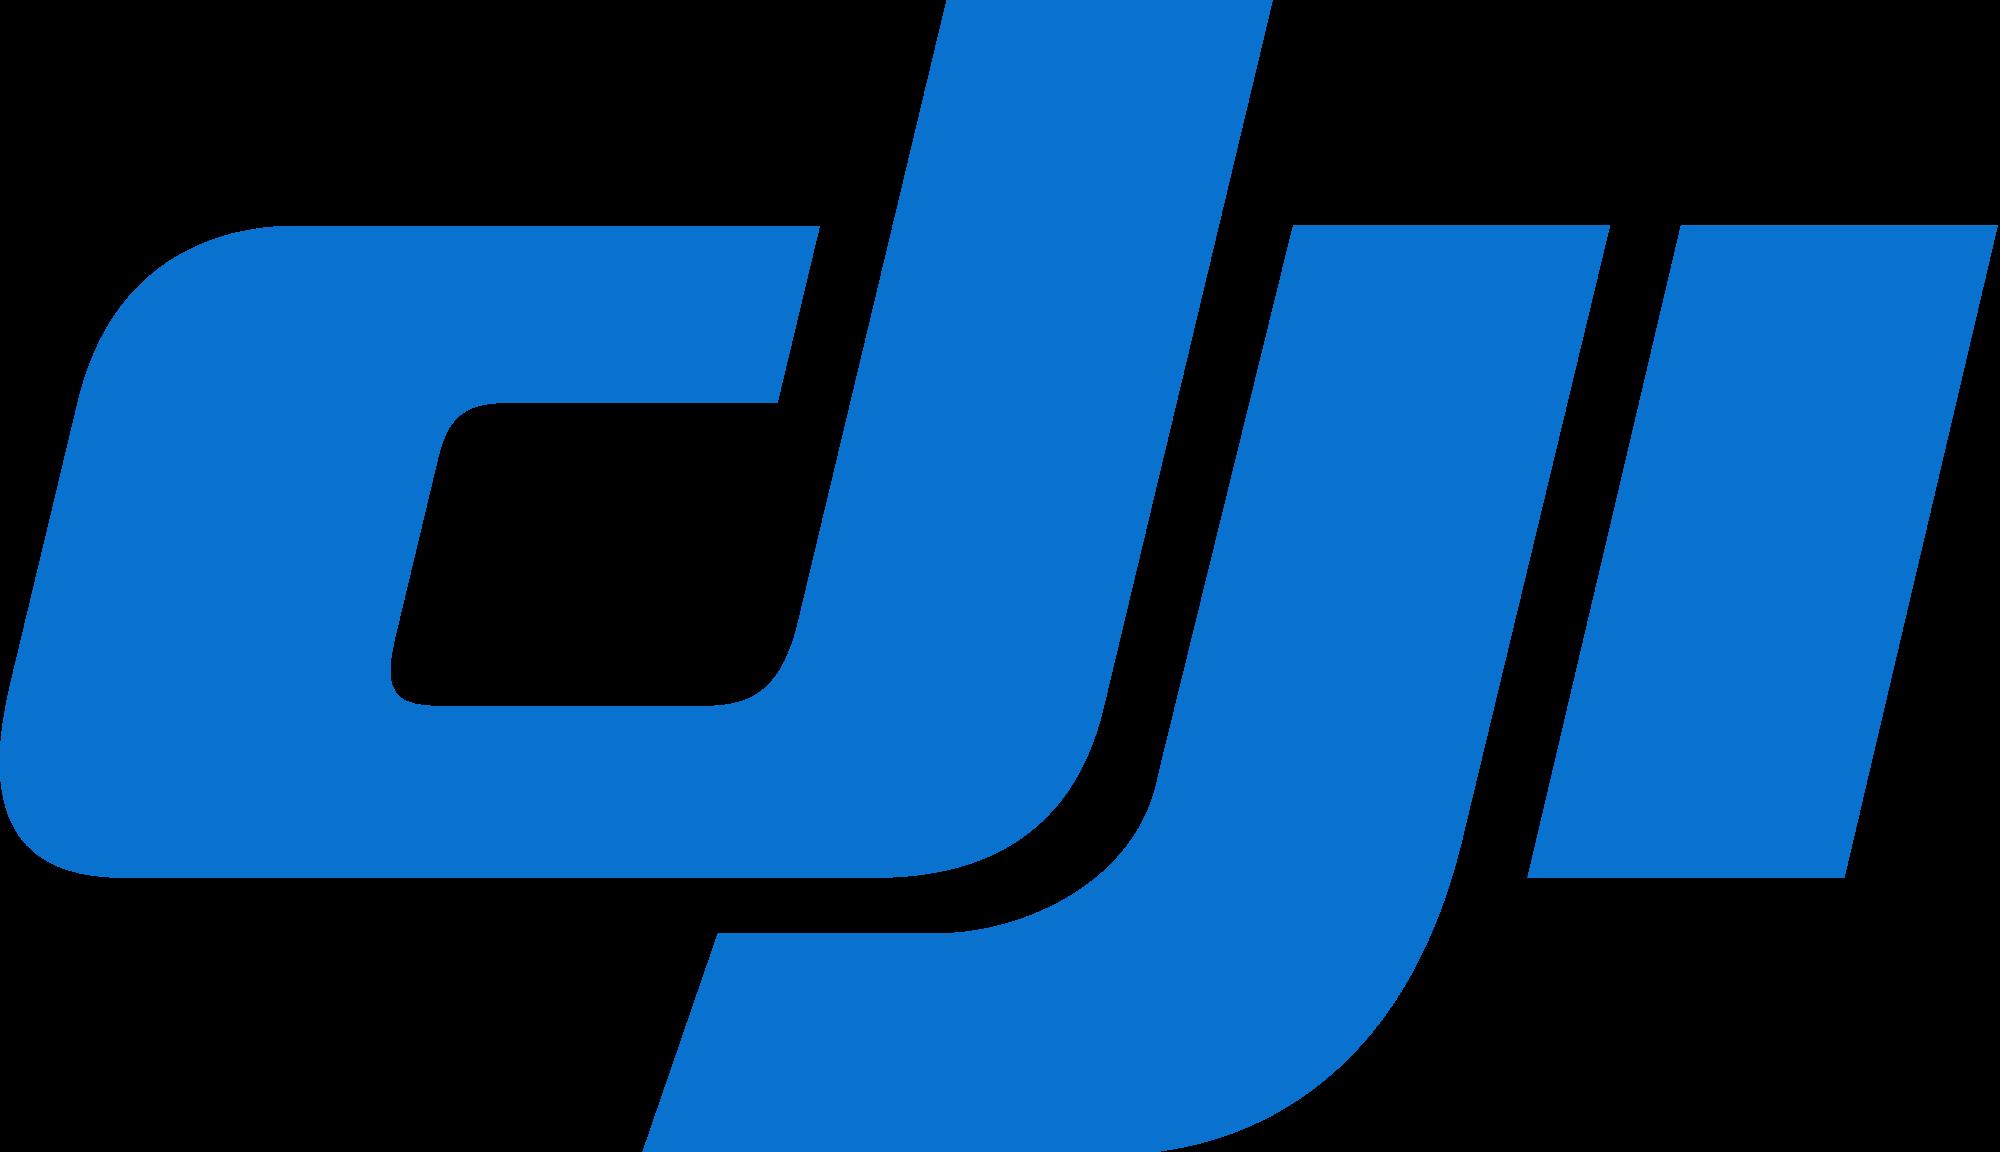 DJI Promotions & Discounts